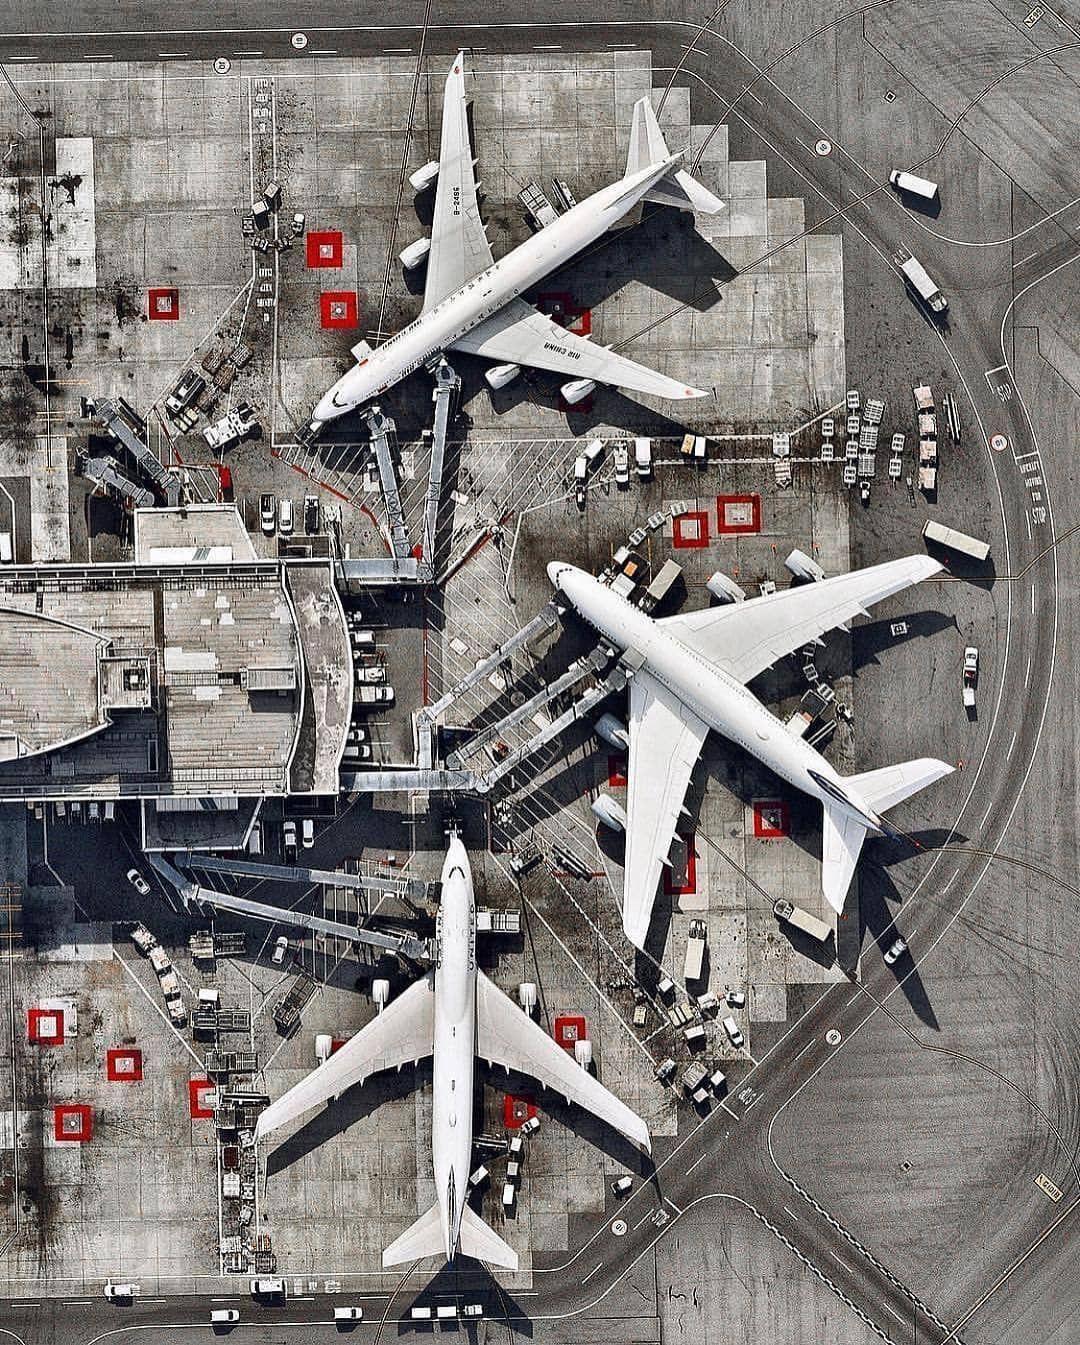 Pin by hava harbiyelipilot on Uçak /jet/pilotlar